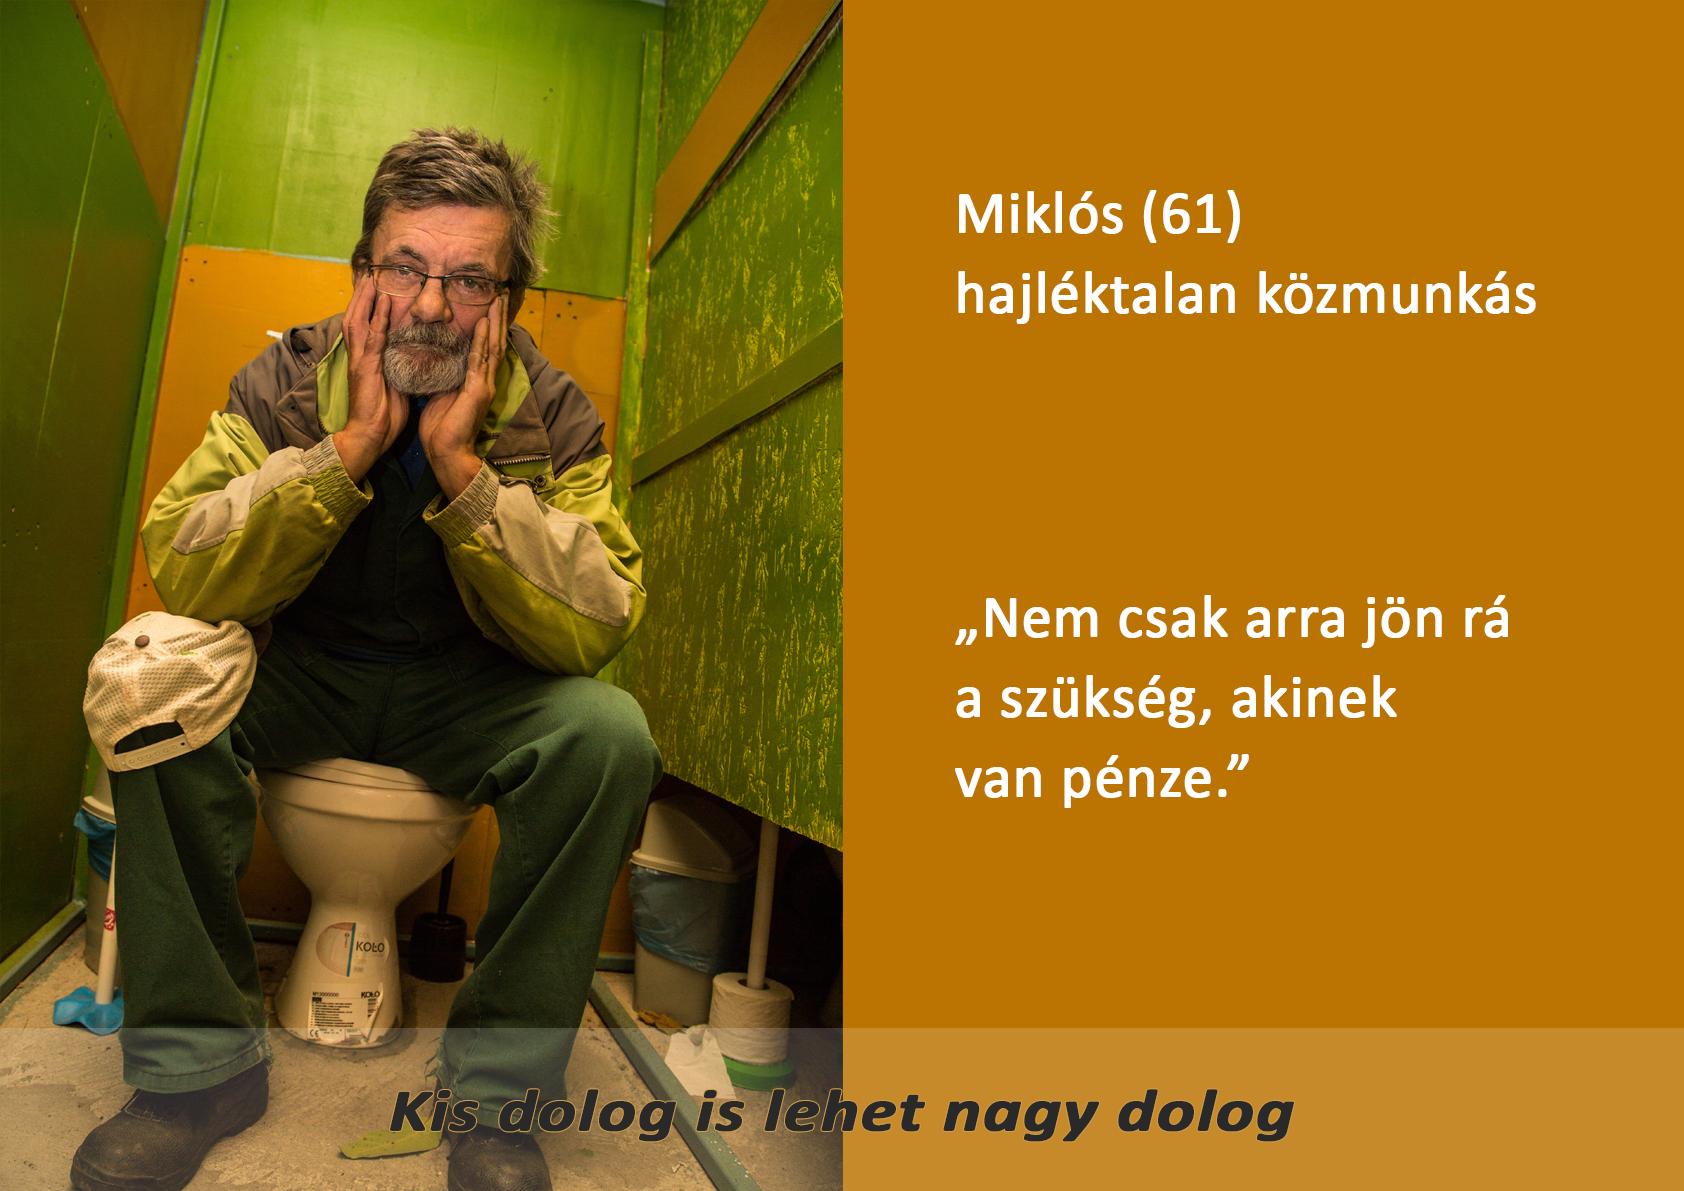 Miklos002